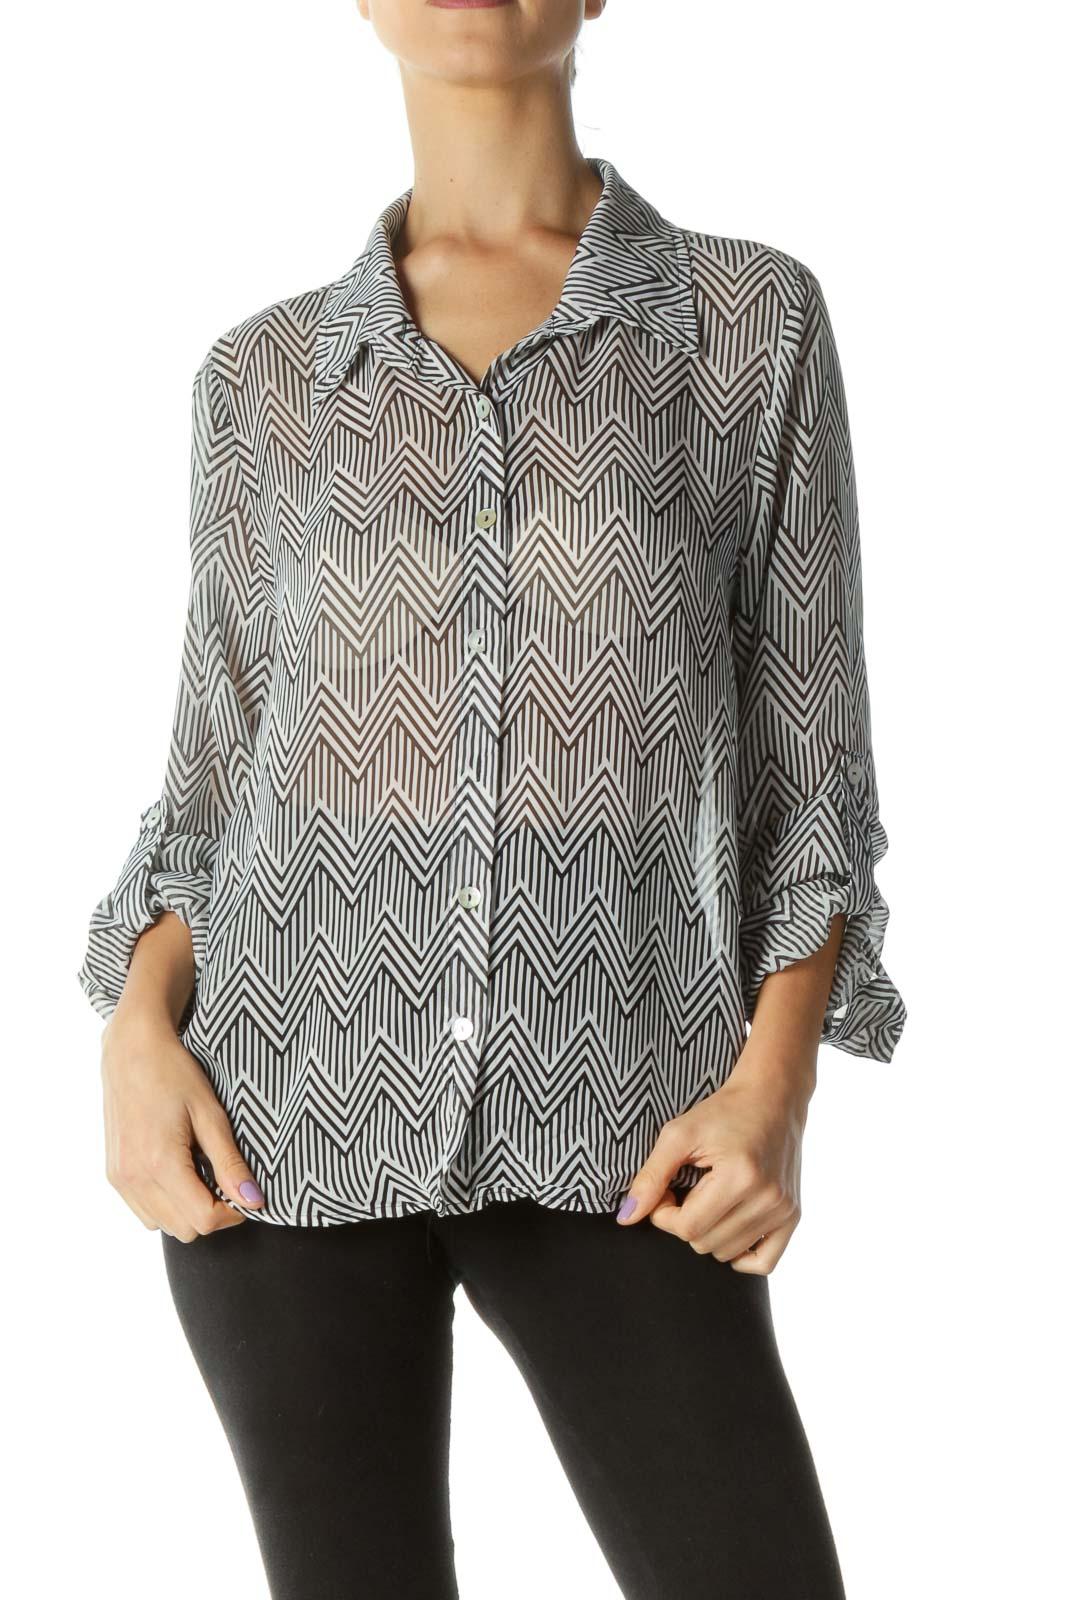 Black White Geometric Print Sheer Shirt Front